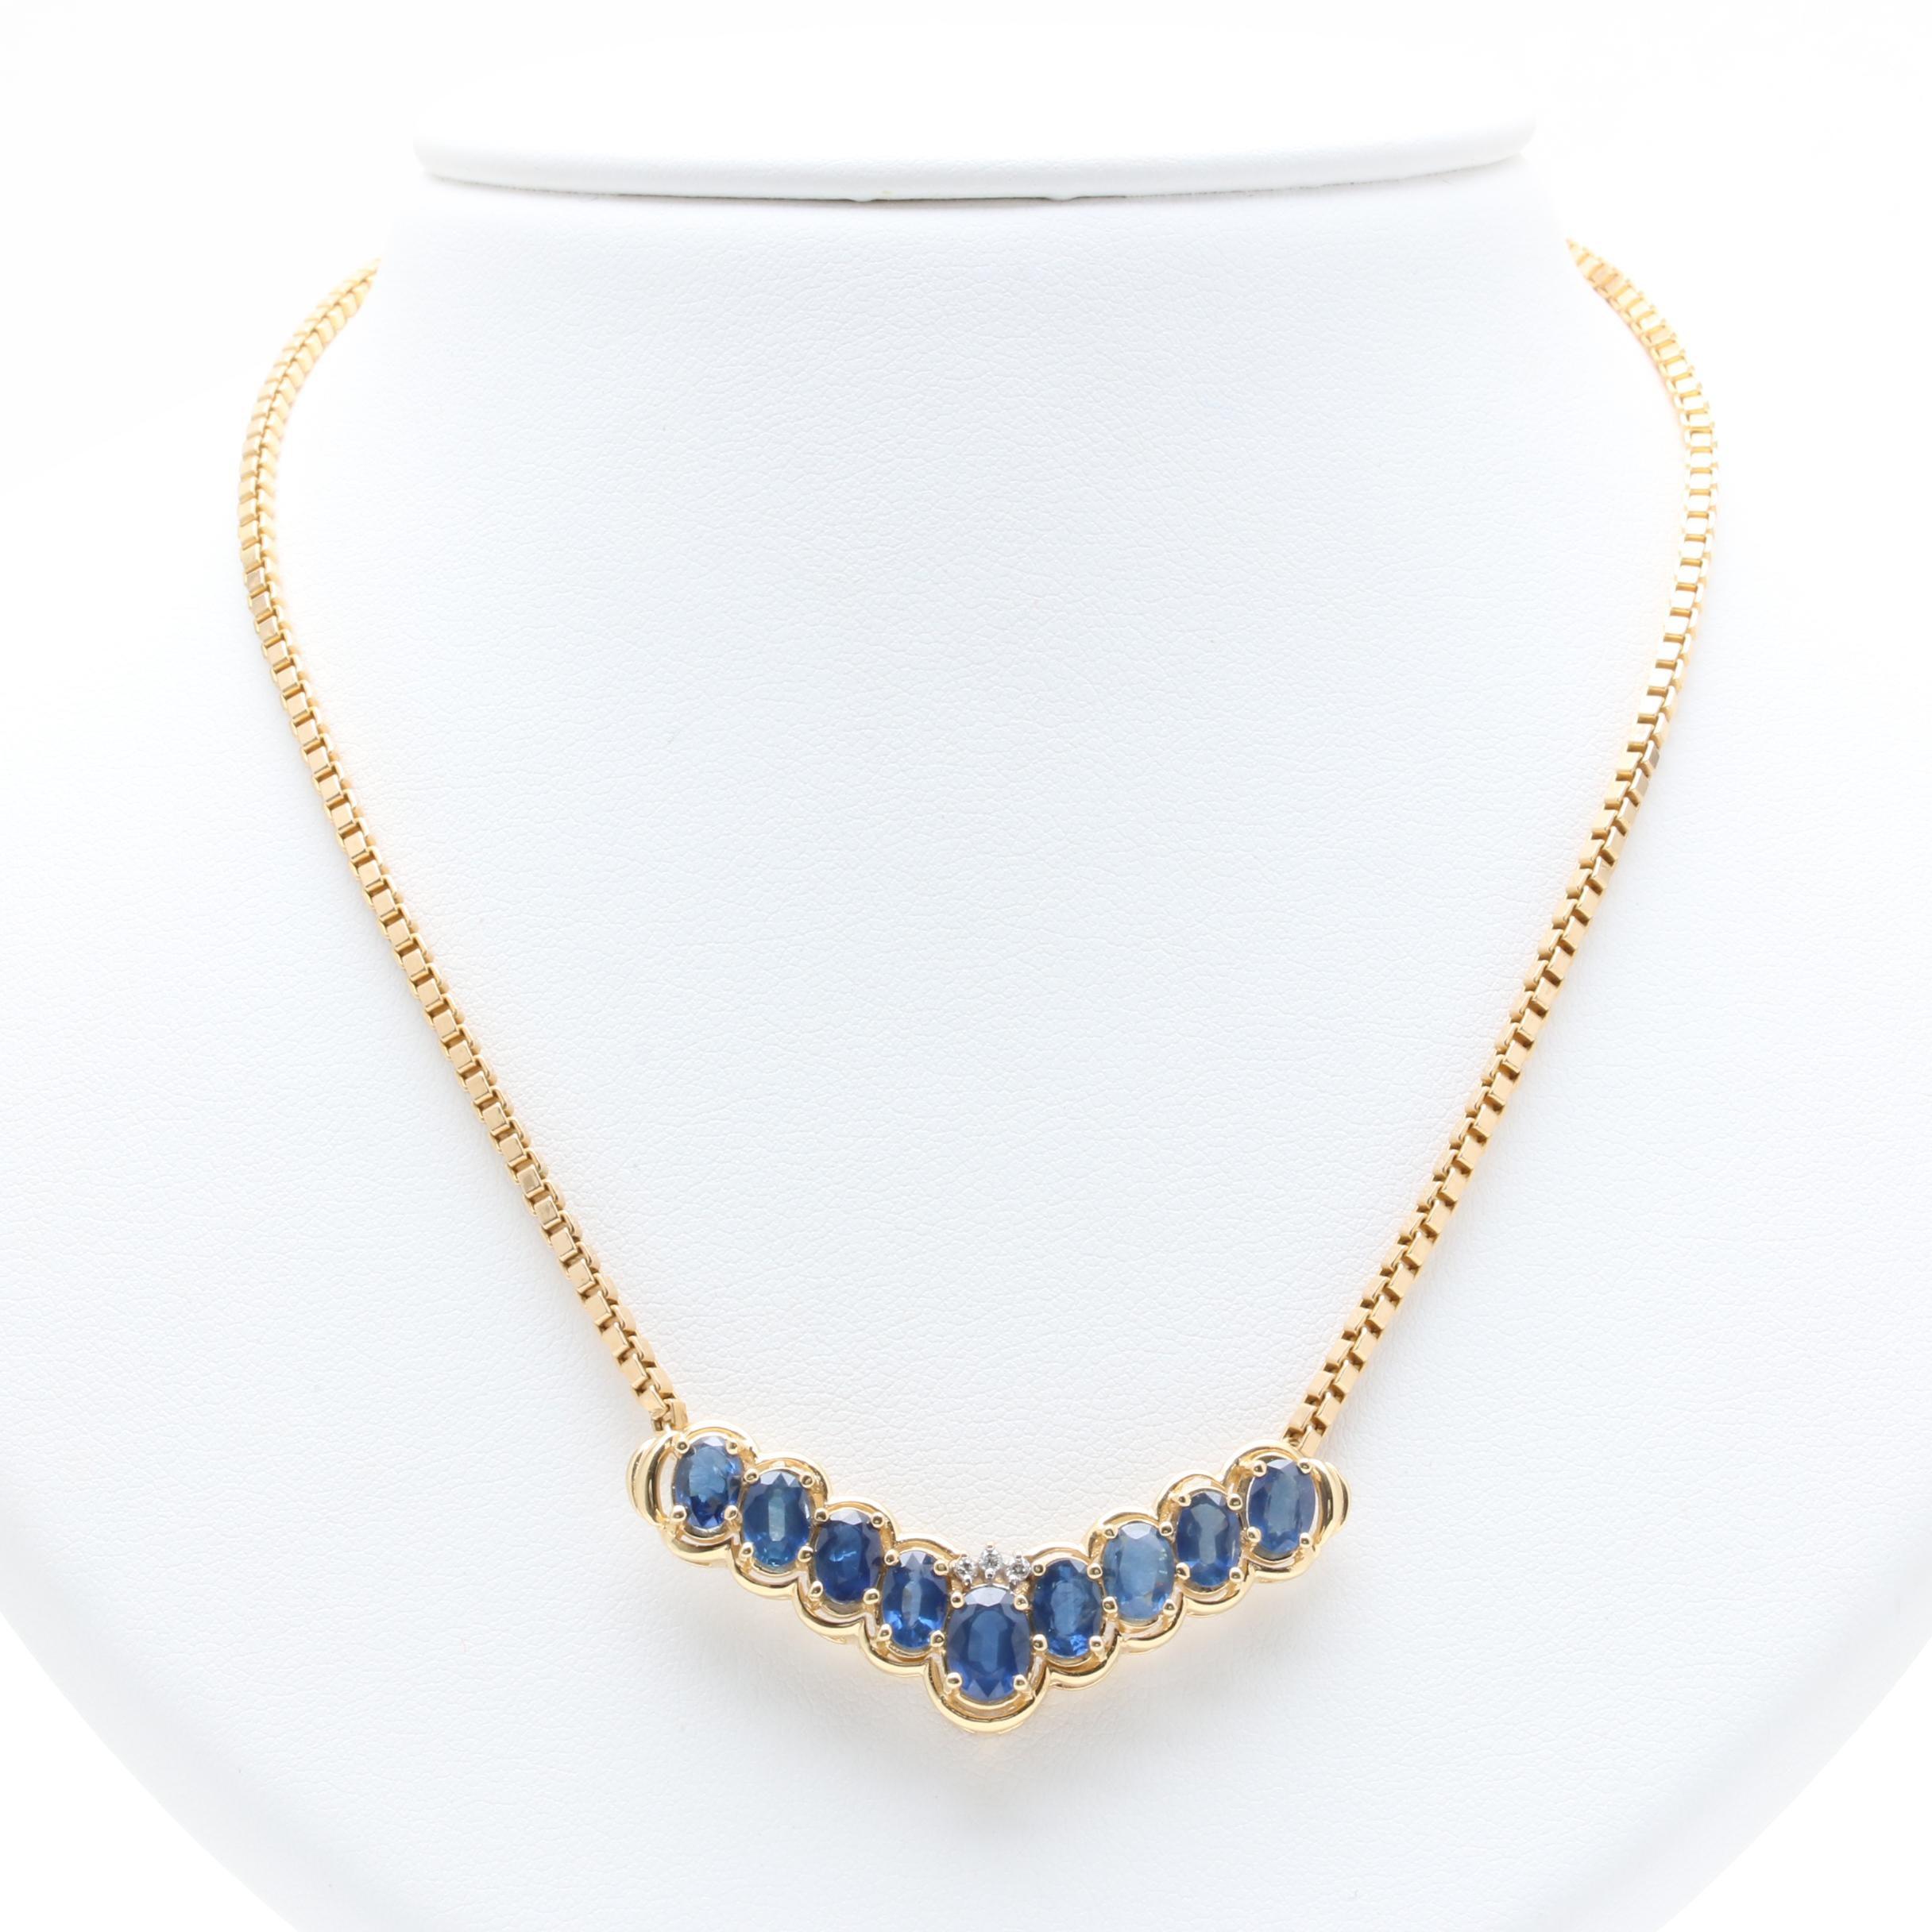 Milor 14K Yellow Gold Blue Sapphire Diamond Necklace